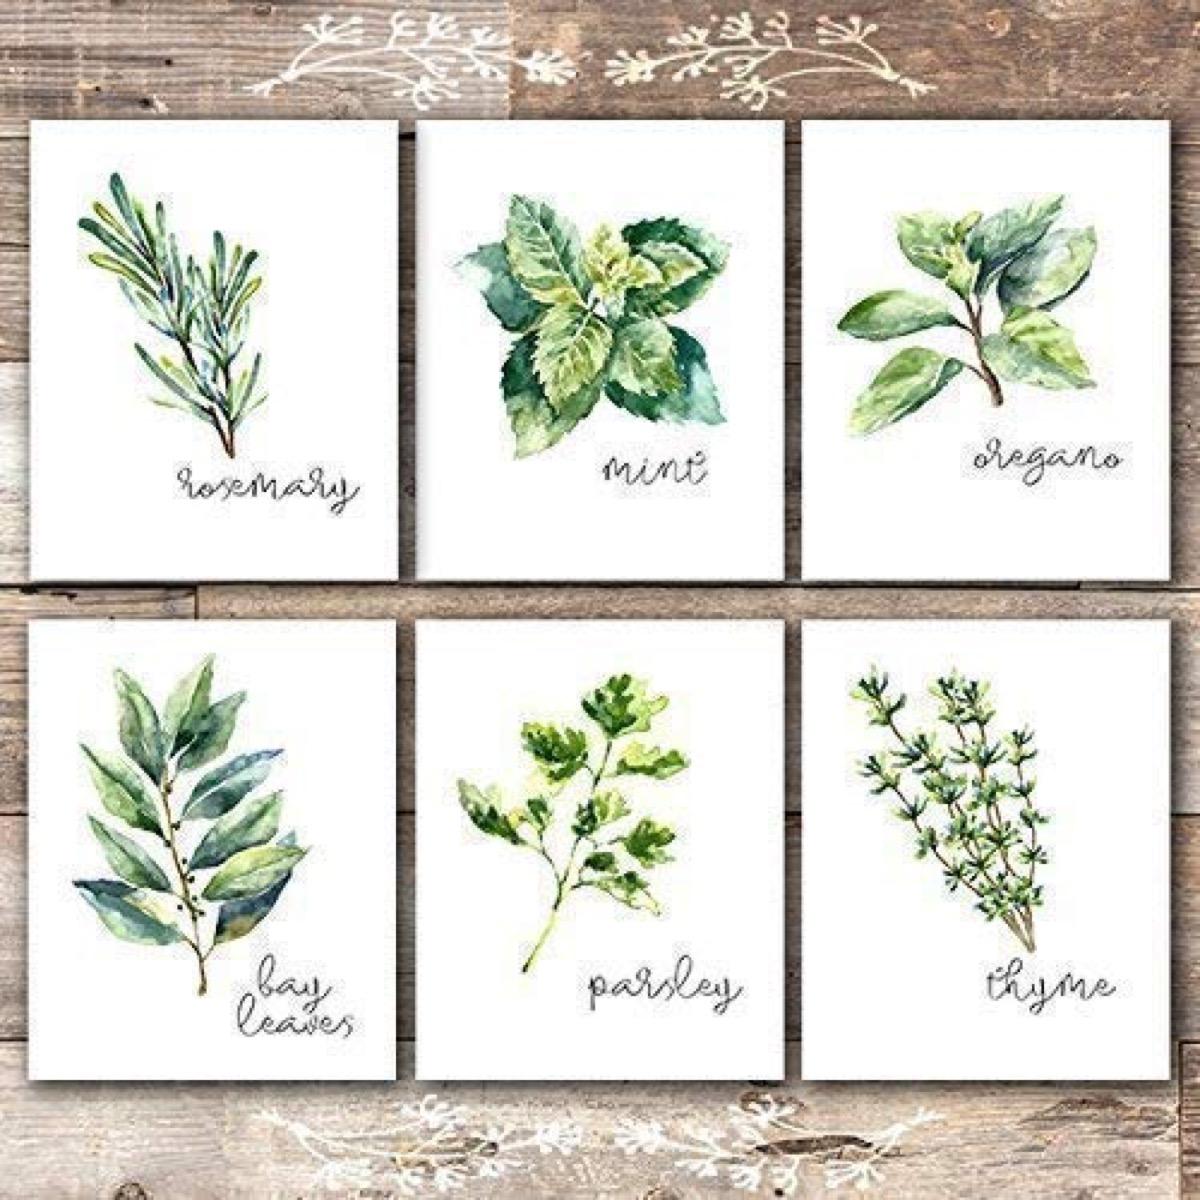 Herbal Art Prints {Handmade Items From Amazon}